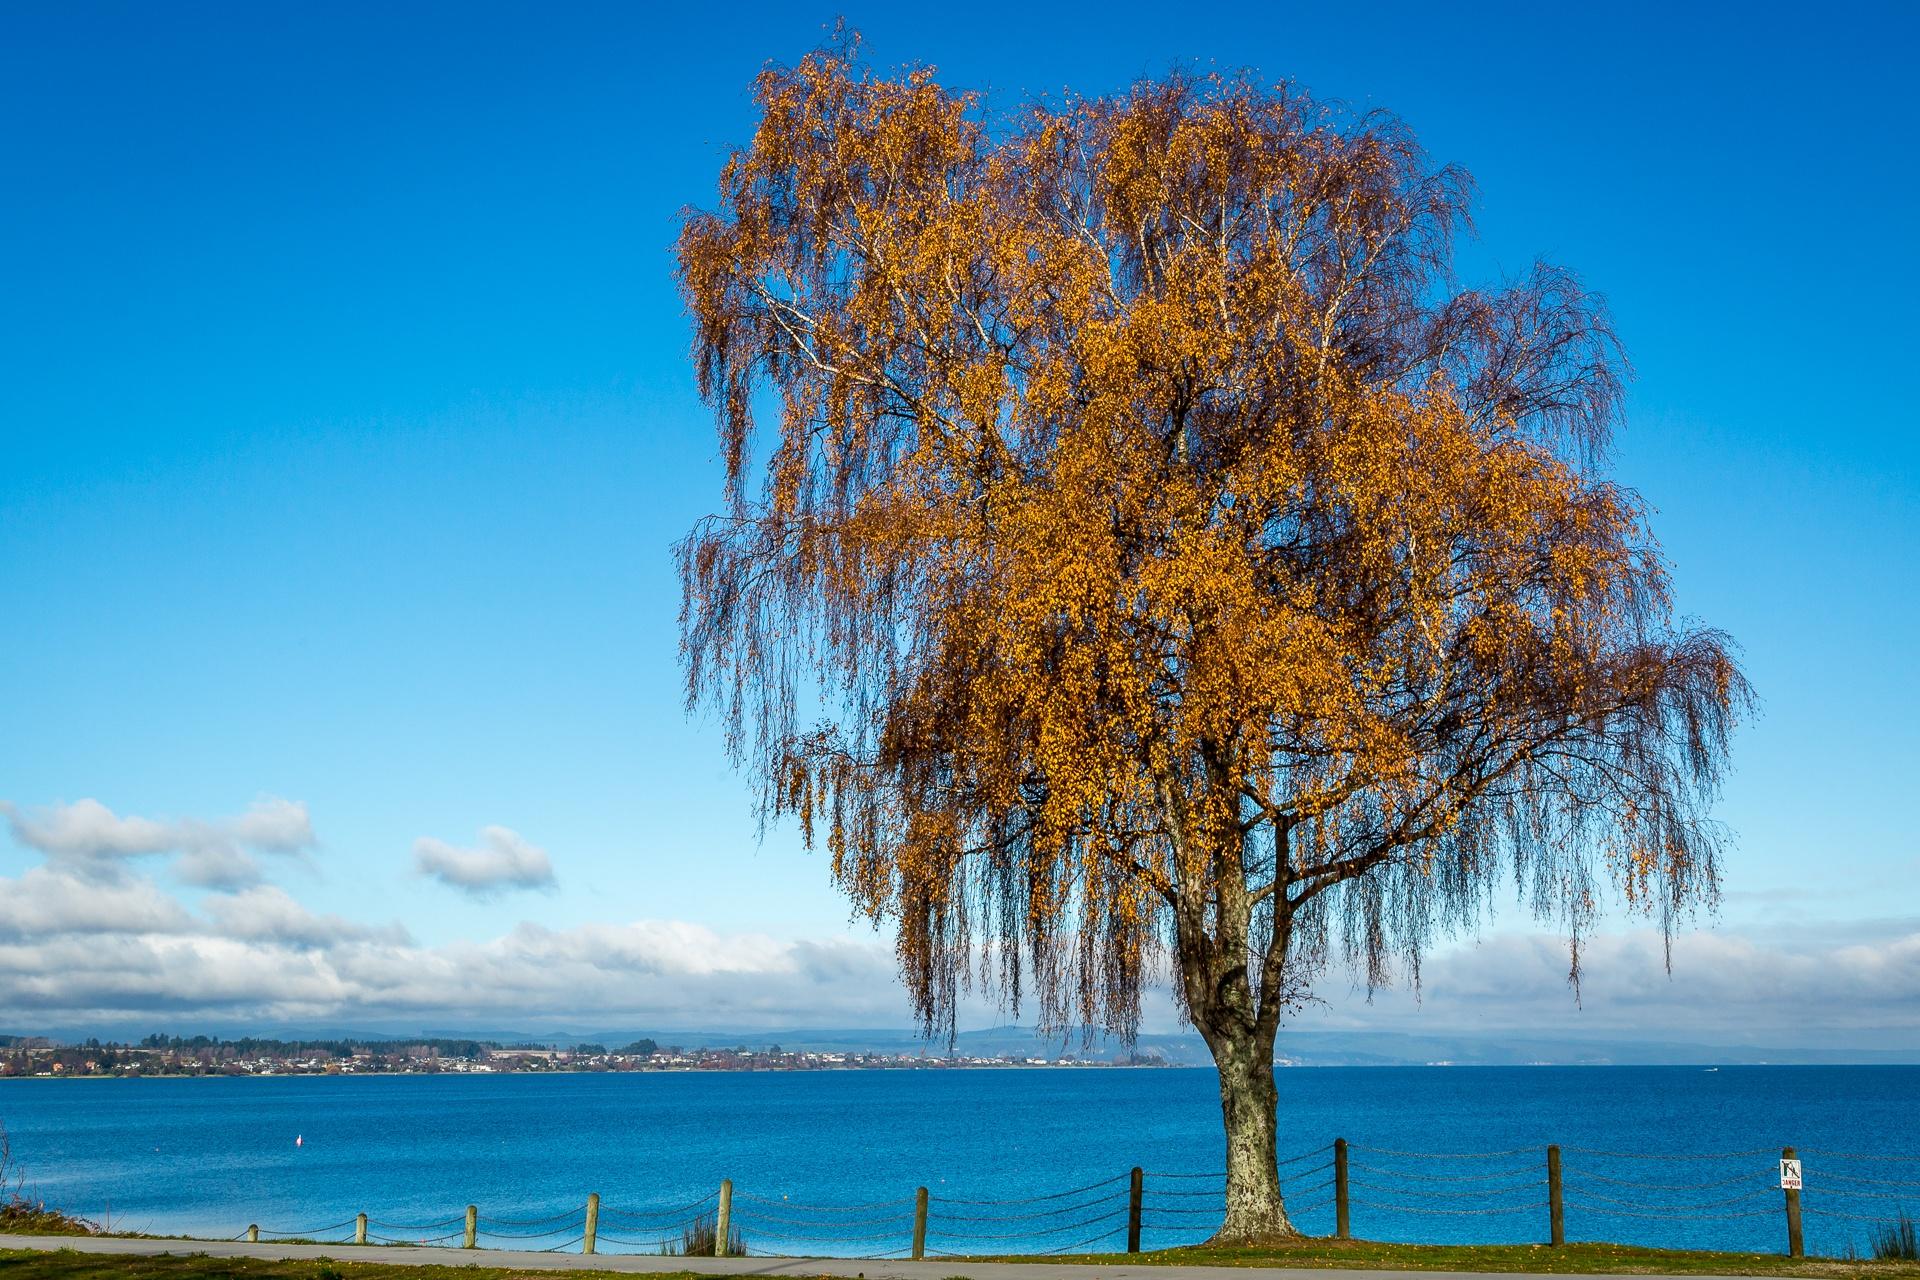 Autumn colours at Lake Taupo